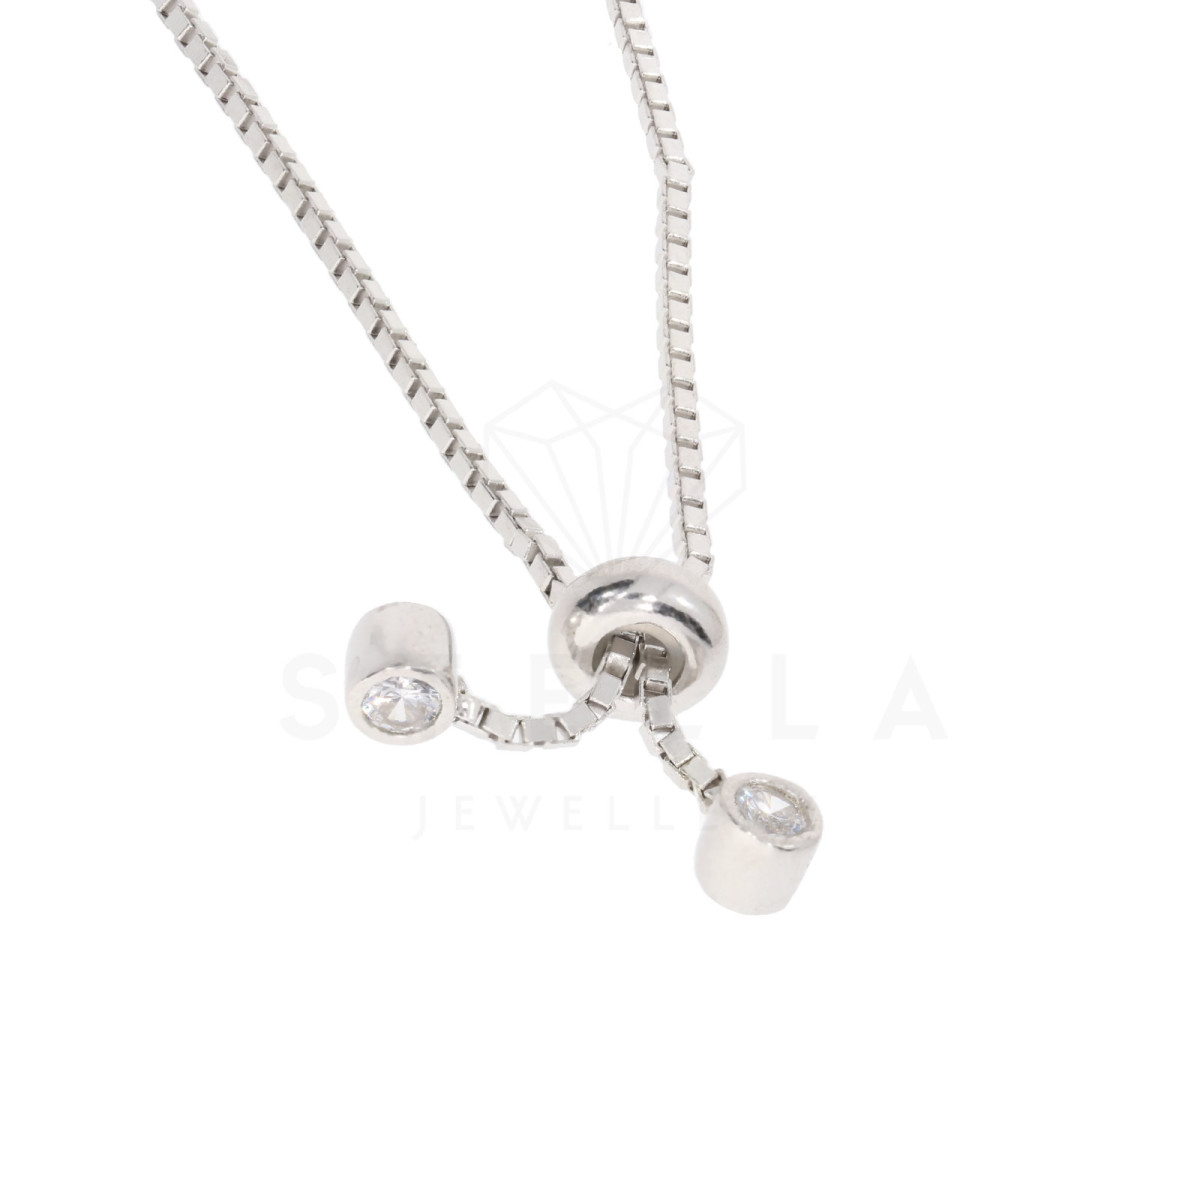 Damen Armband Plättchen Silber 925 Kreis Armkette Zirkonia inkl. Gravur